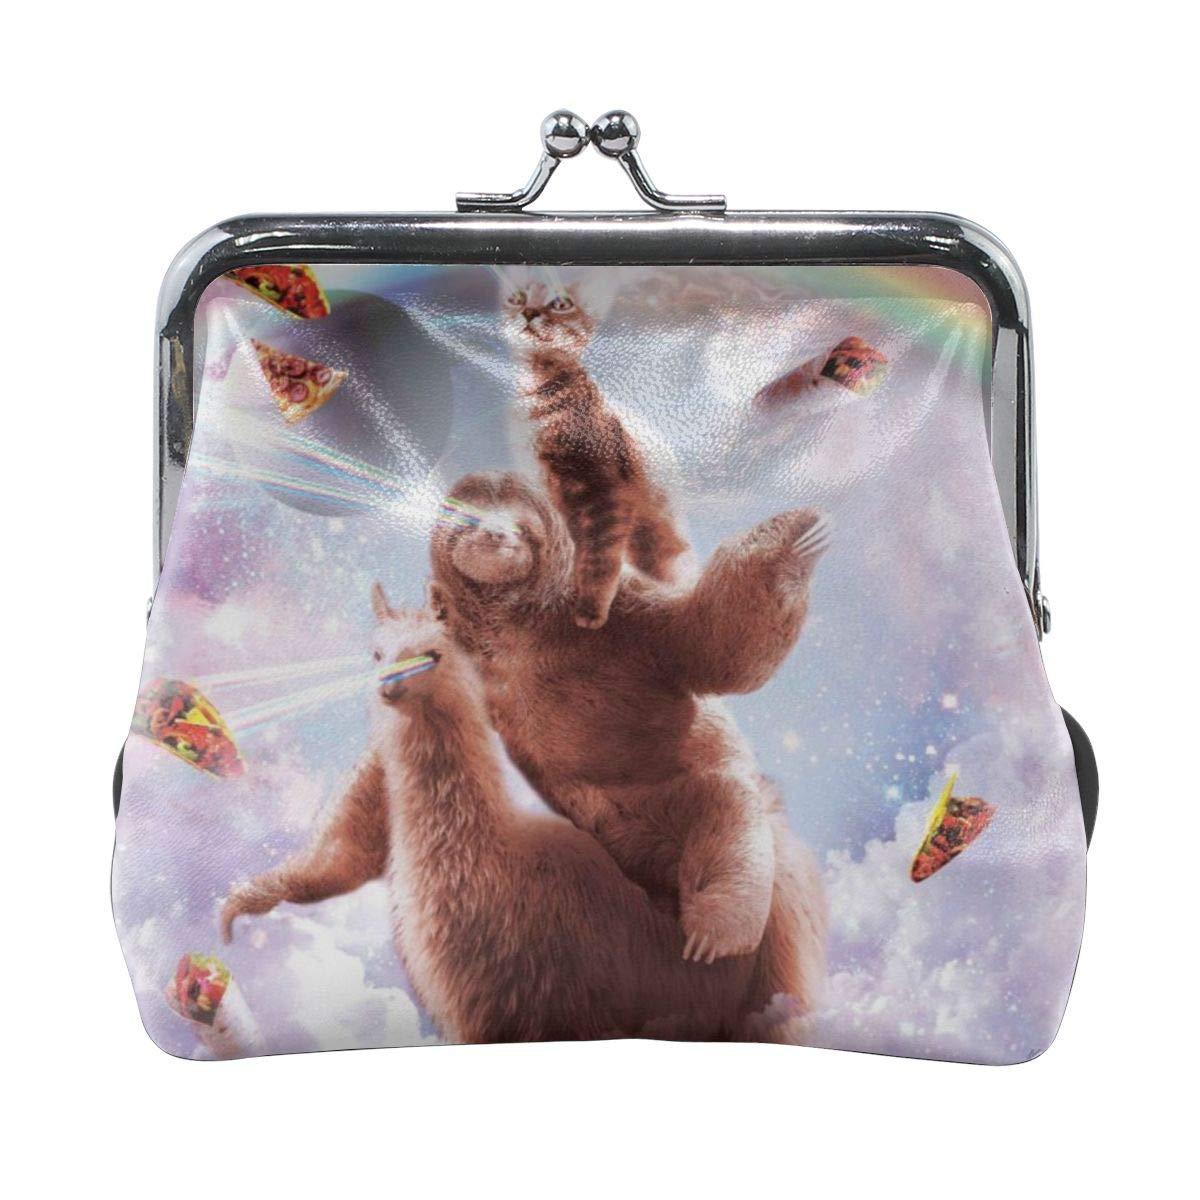 Laser Eyes Cat Sloth Llama Cute Buckle Coin Purses Buckle Buckle Change Purse Wallets